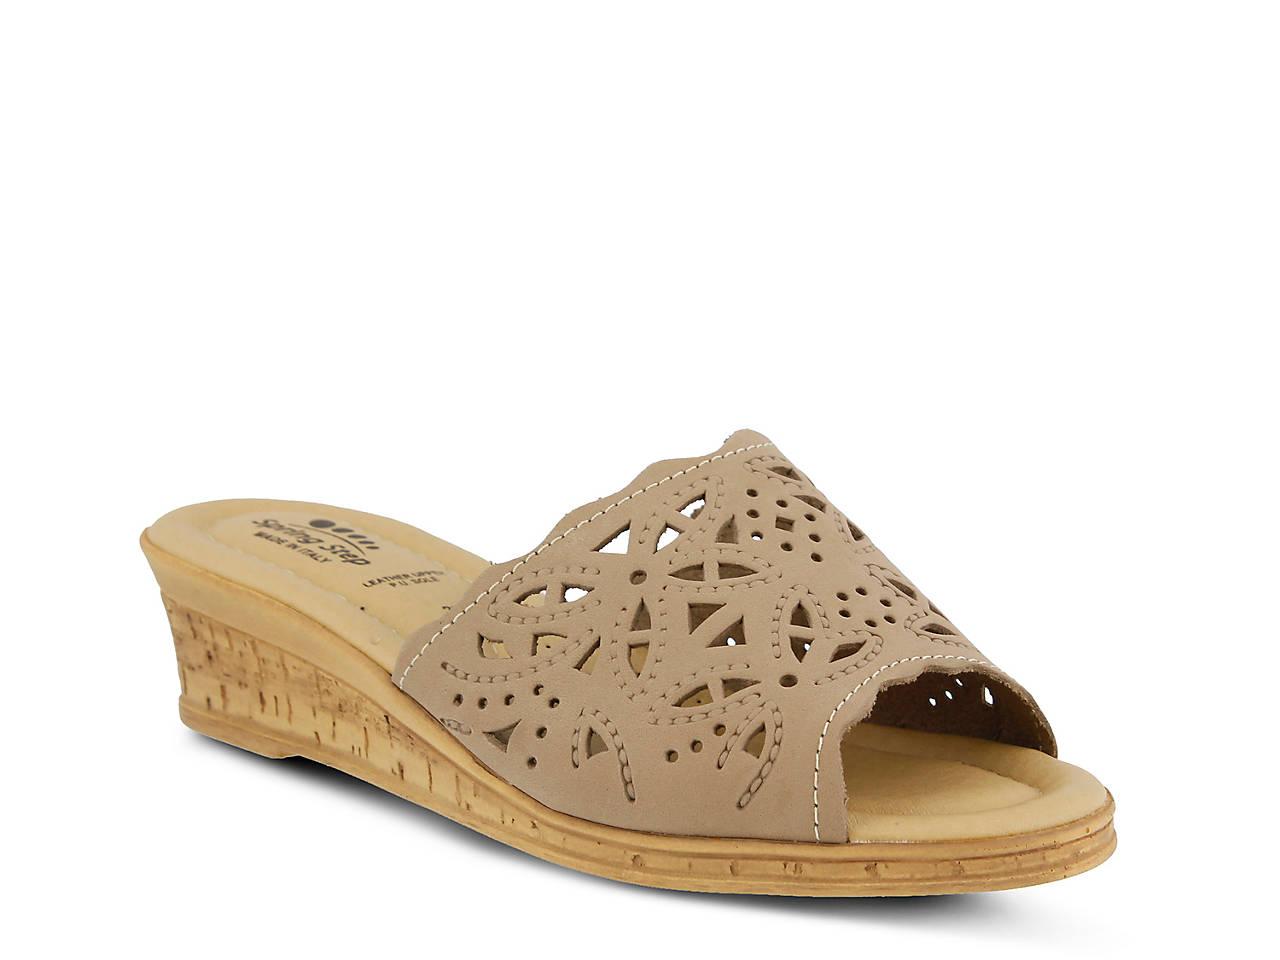 efe1b8f7e61 Spring Step Estella Wedge Sandal Women s Shoes